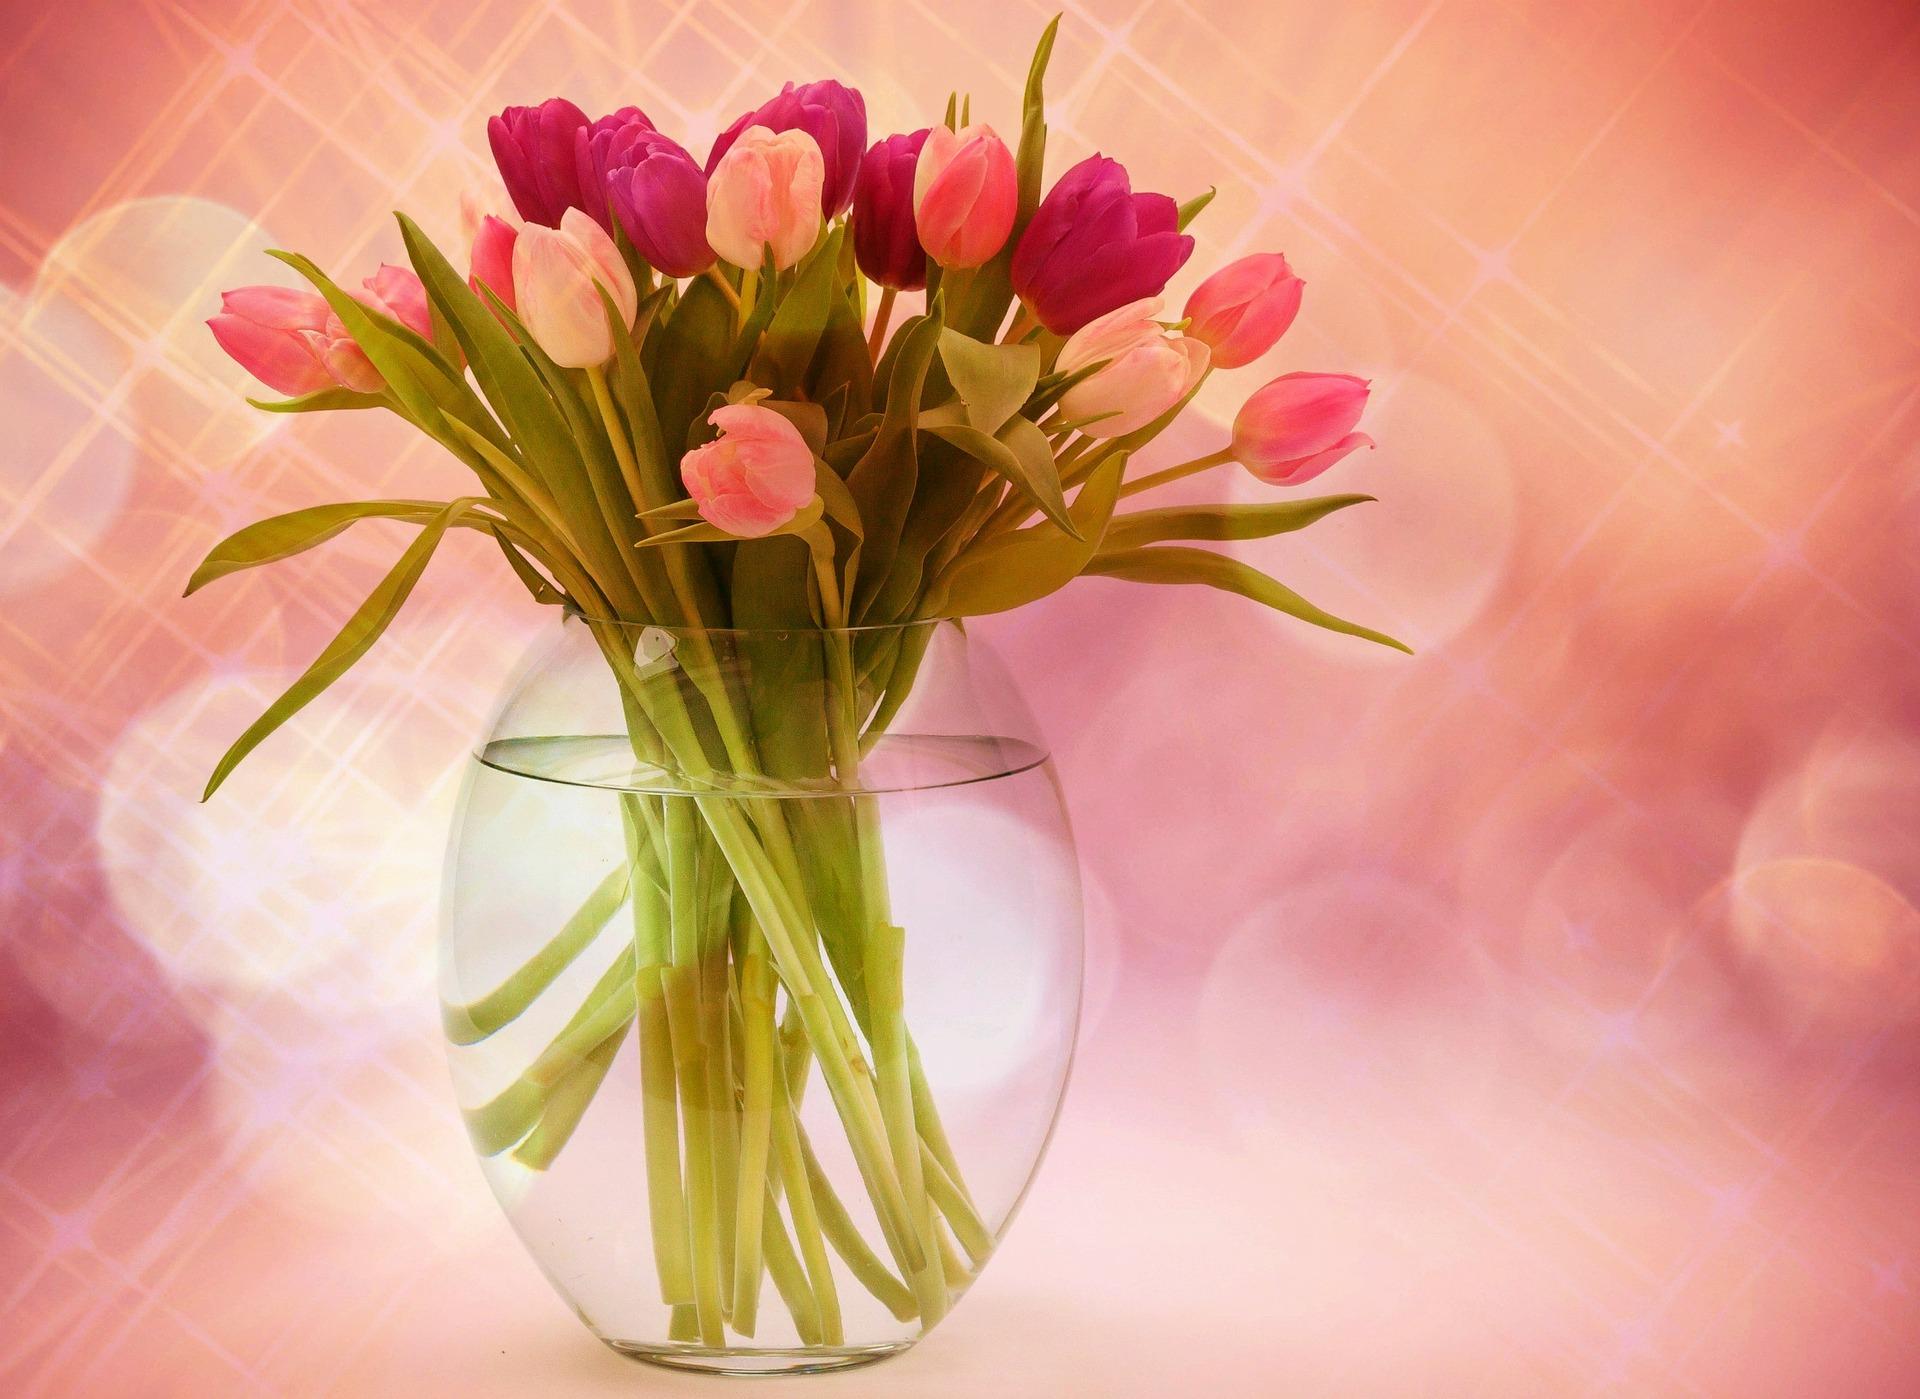 tulips-2219418_1920